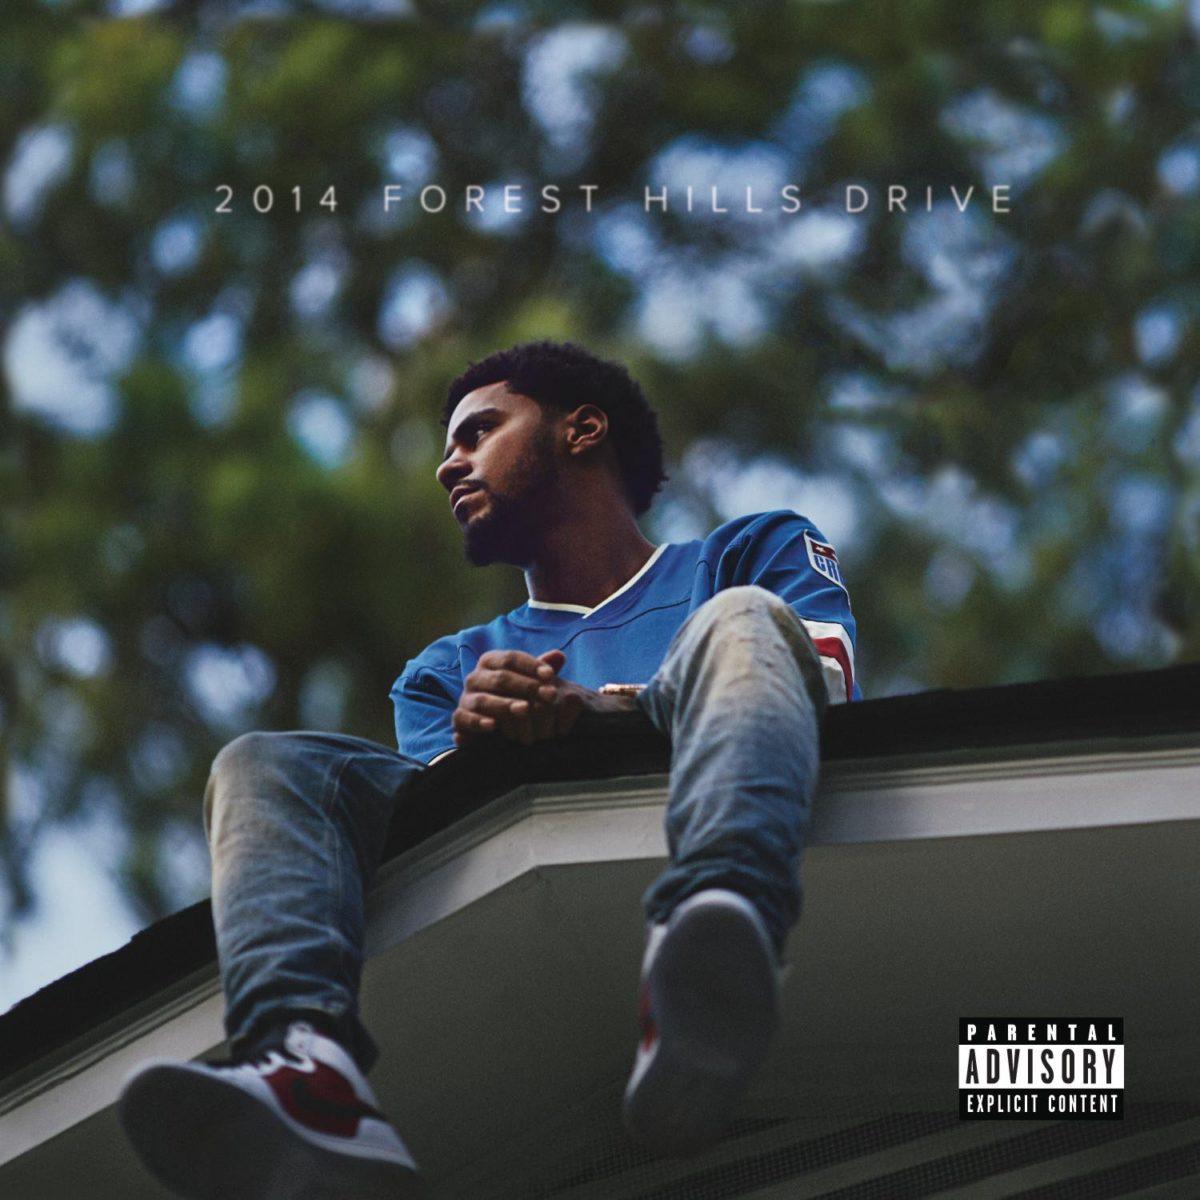 [LUNDISPENSABLE] J.Cole – 2014 Forest Hills Drive